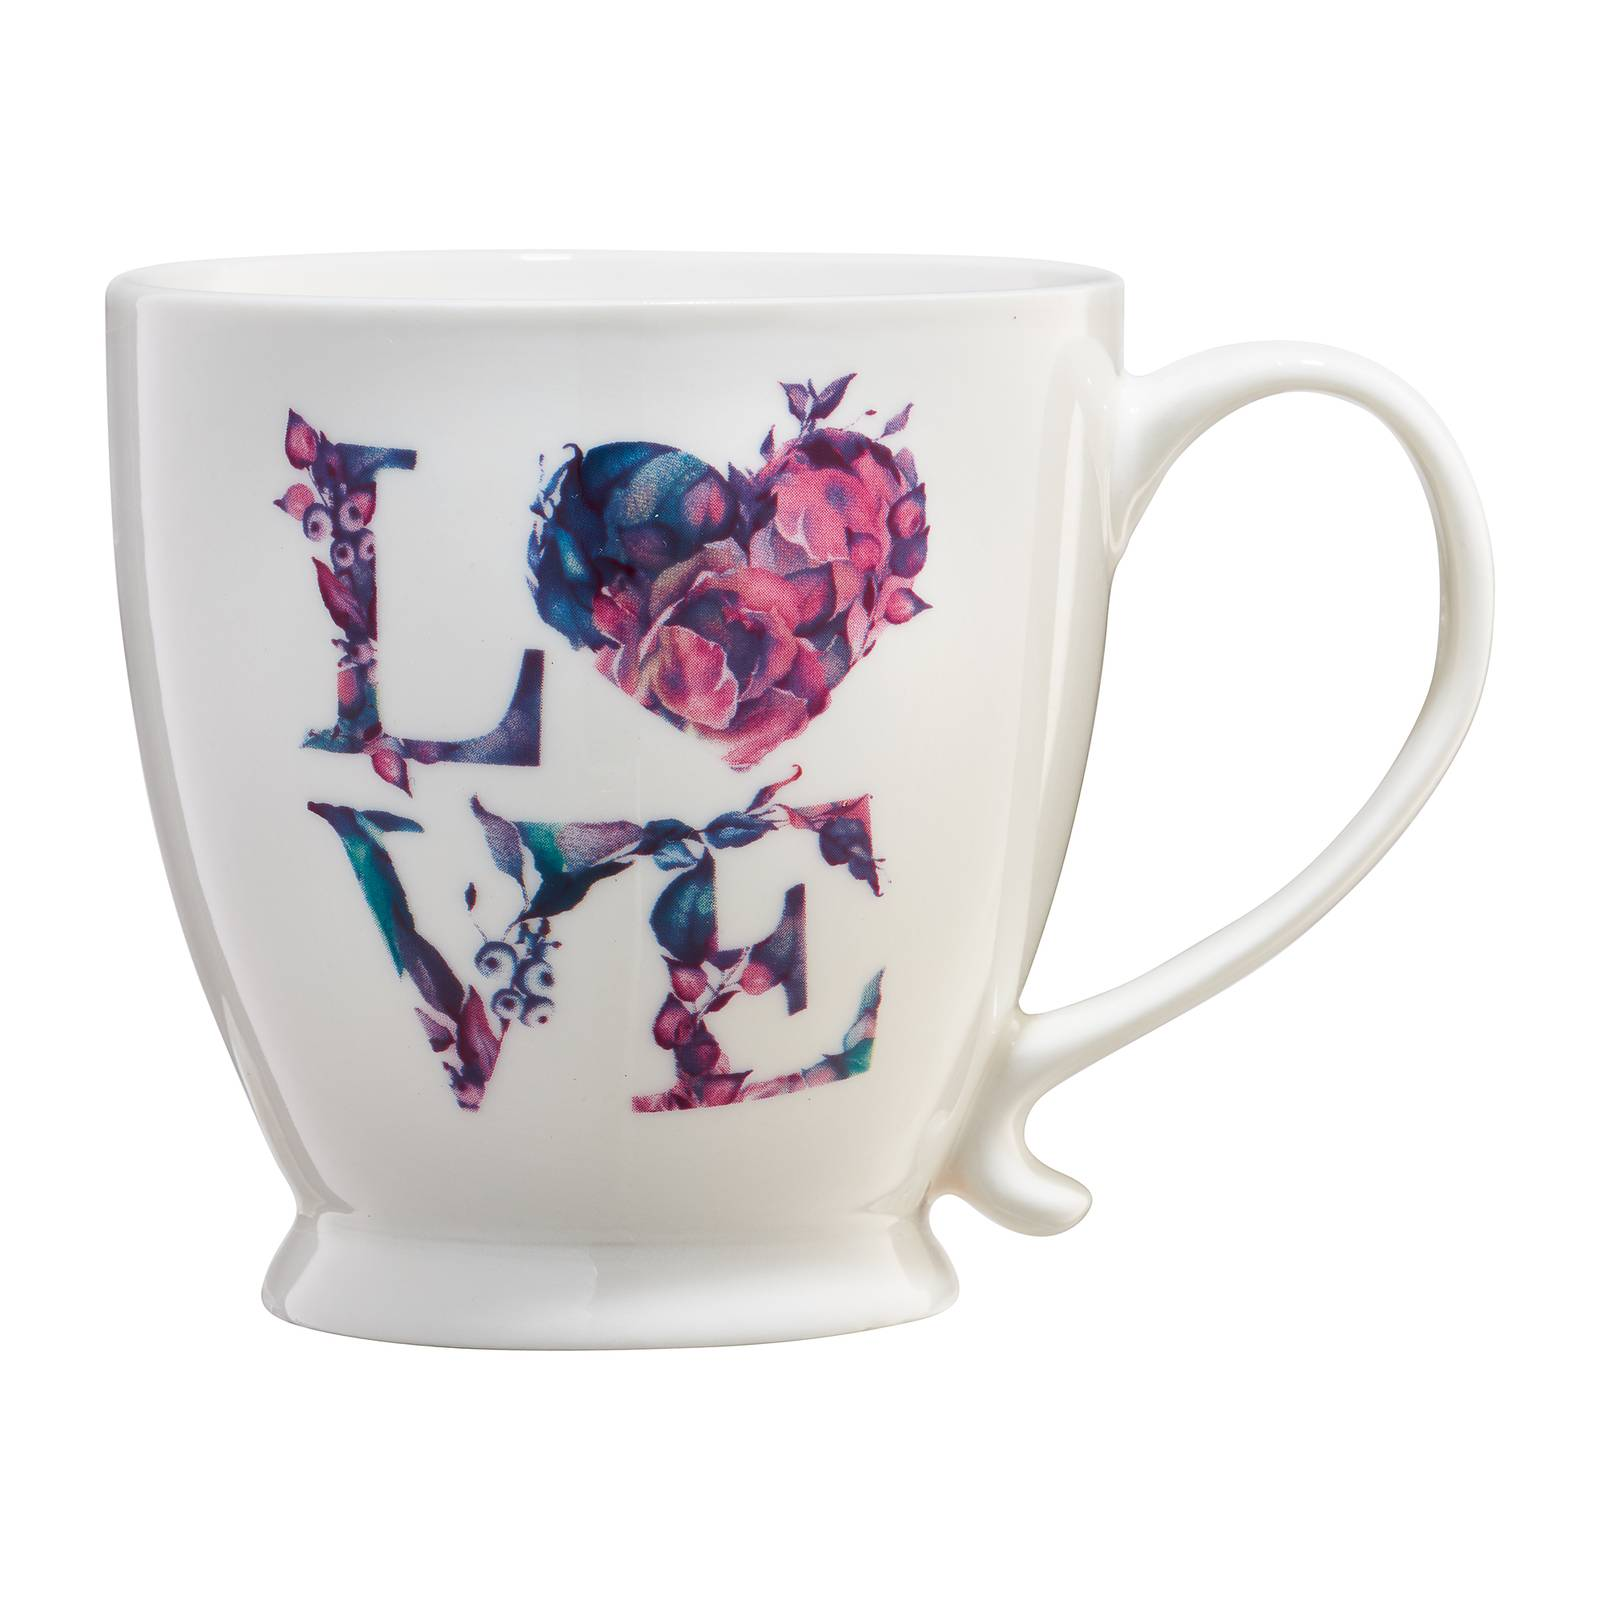 Kubek porcelanowy Love Letters kwiatowy napis 400 ml AMBITION